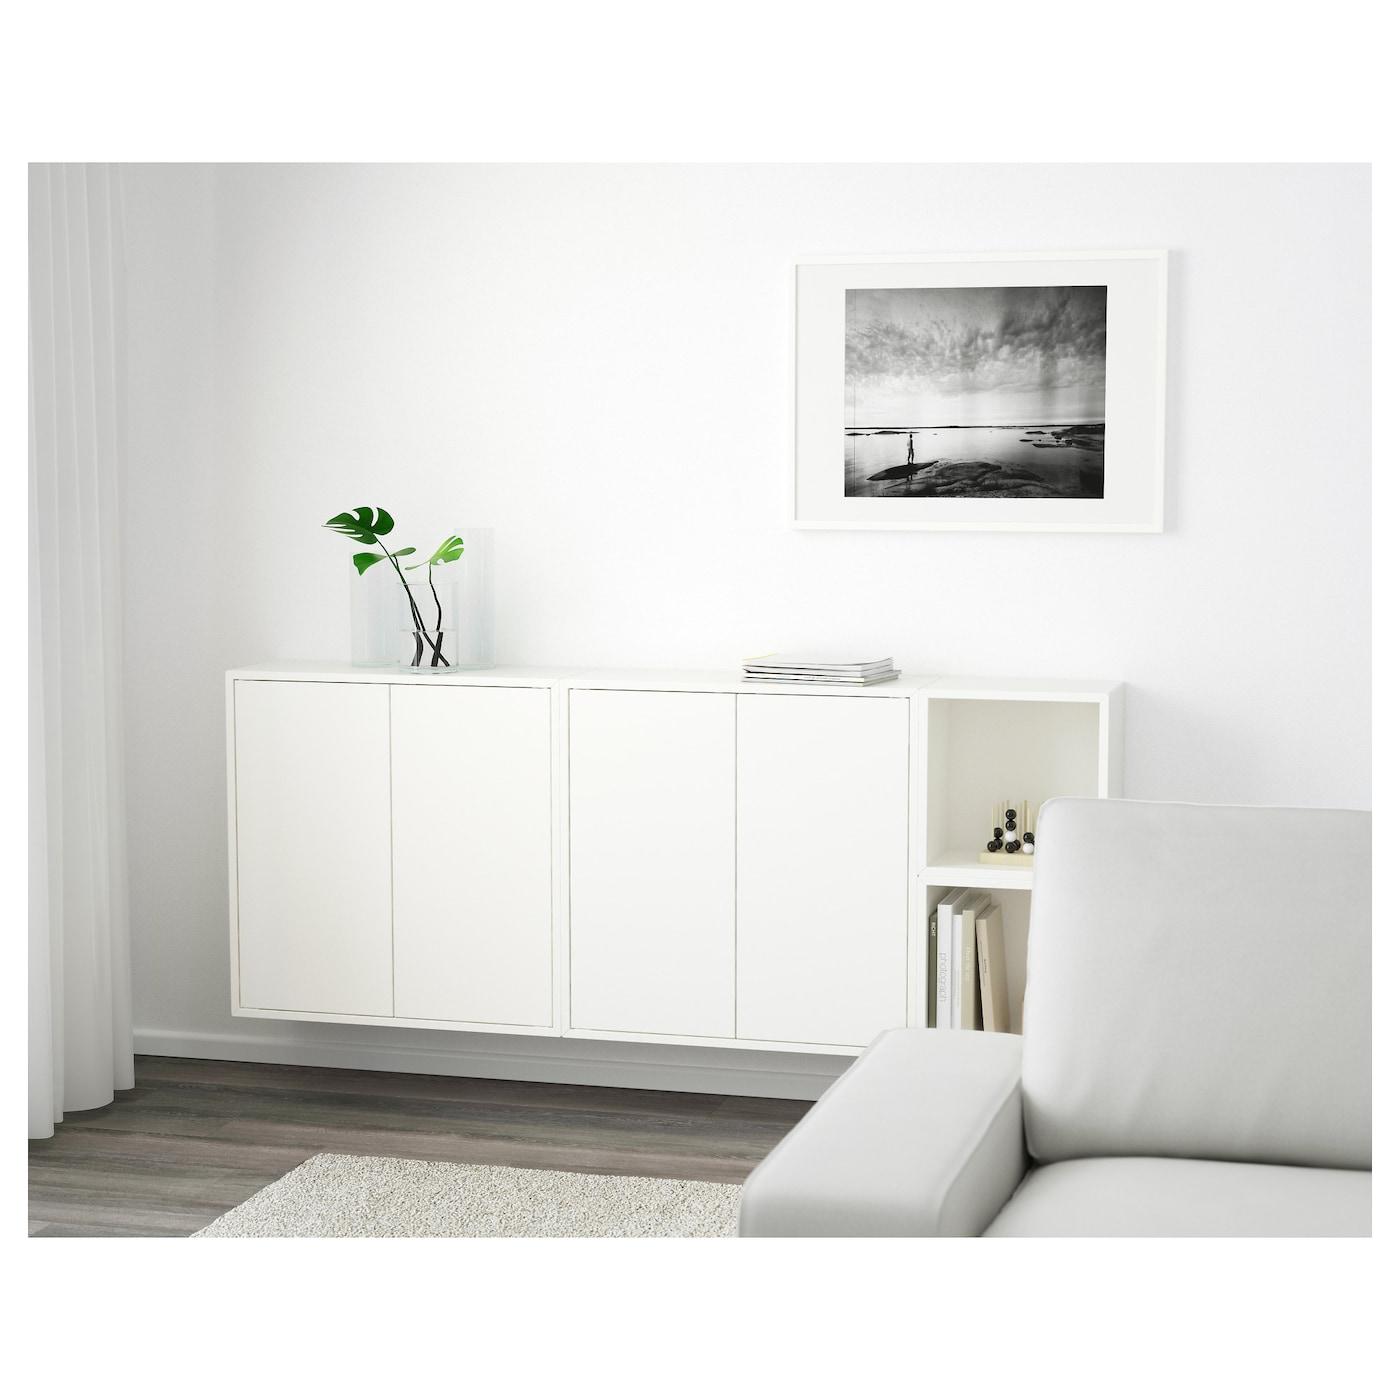 Ikea Eket Wall Mounted Cabinet Combination